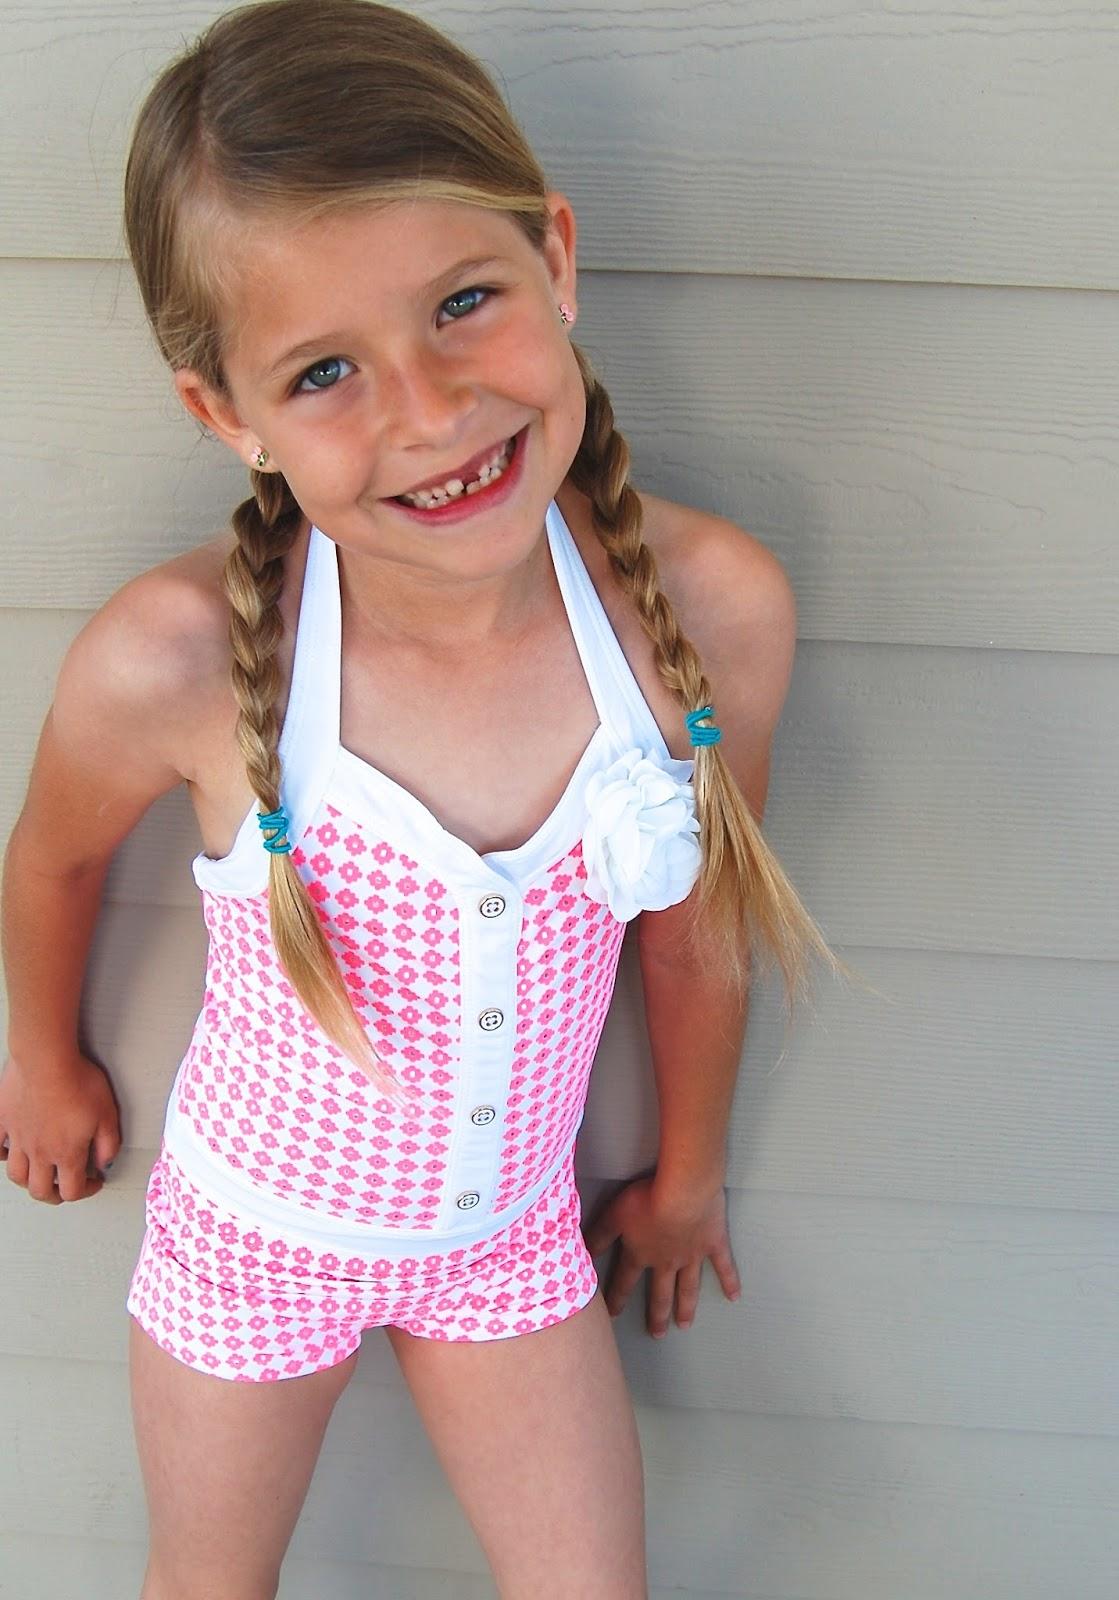 Commit Girls pee in bathing suit